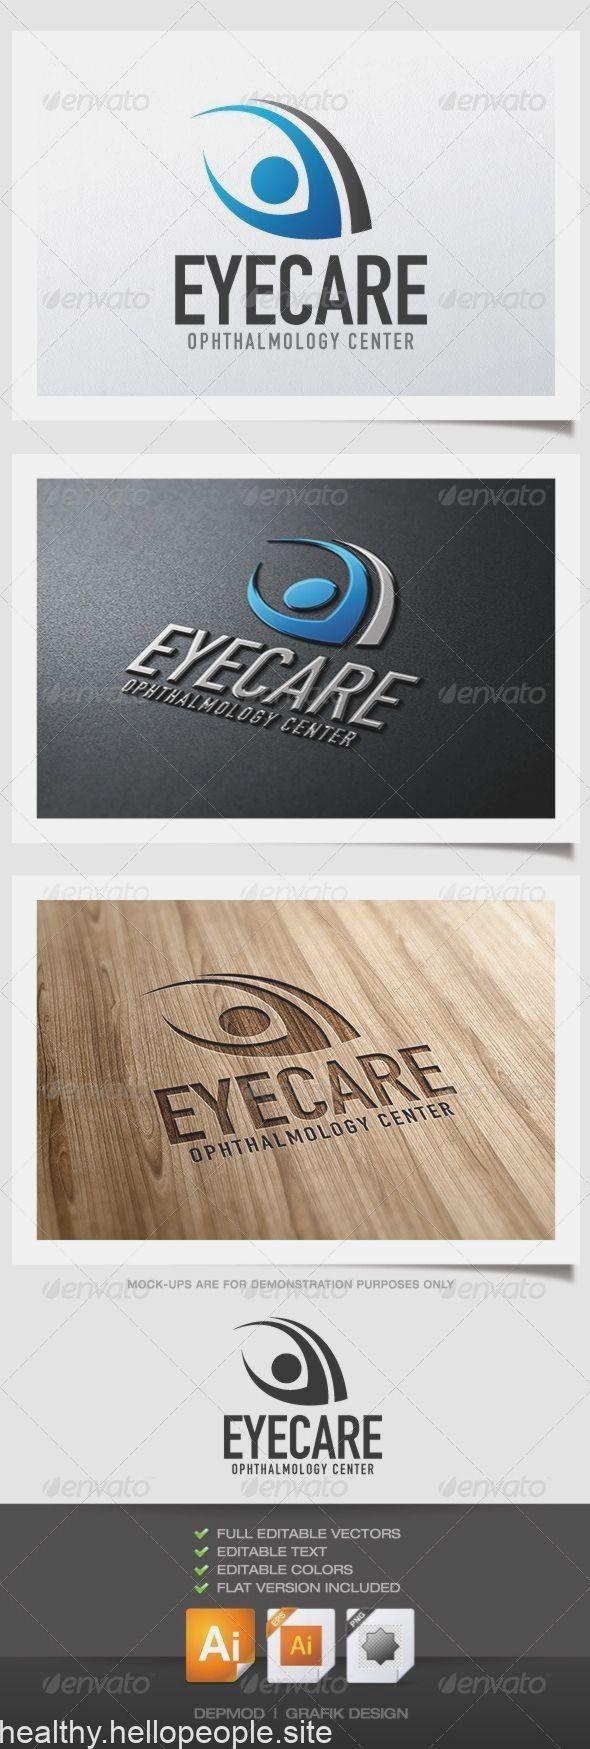 Eye #Care #Logo #- #Vektor #EPS # #watch # #web #• #Erhältlich #hier #→ #graphicriver.net #…..